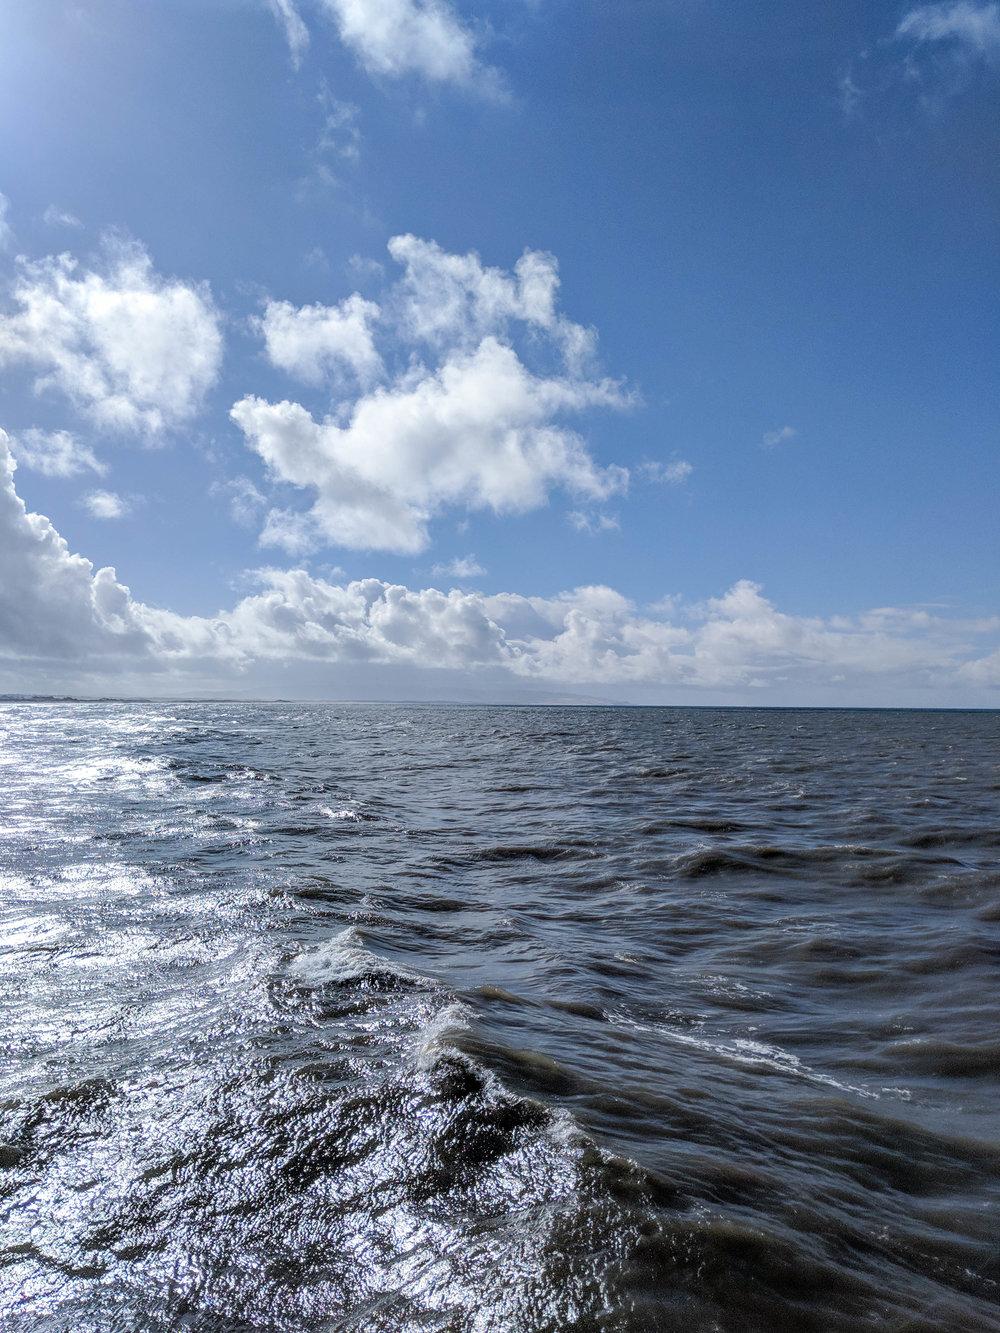 bri rinehart; photography; california; pismo beach; ocean; clouds